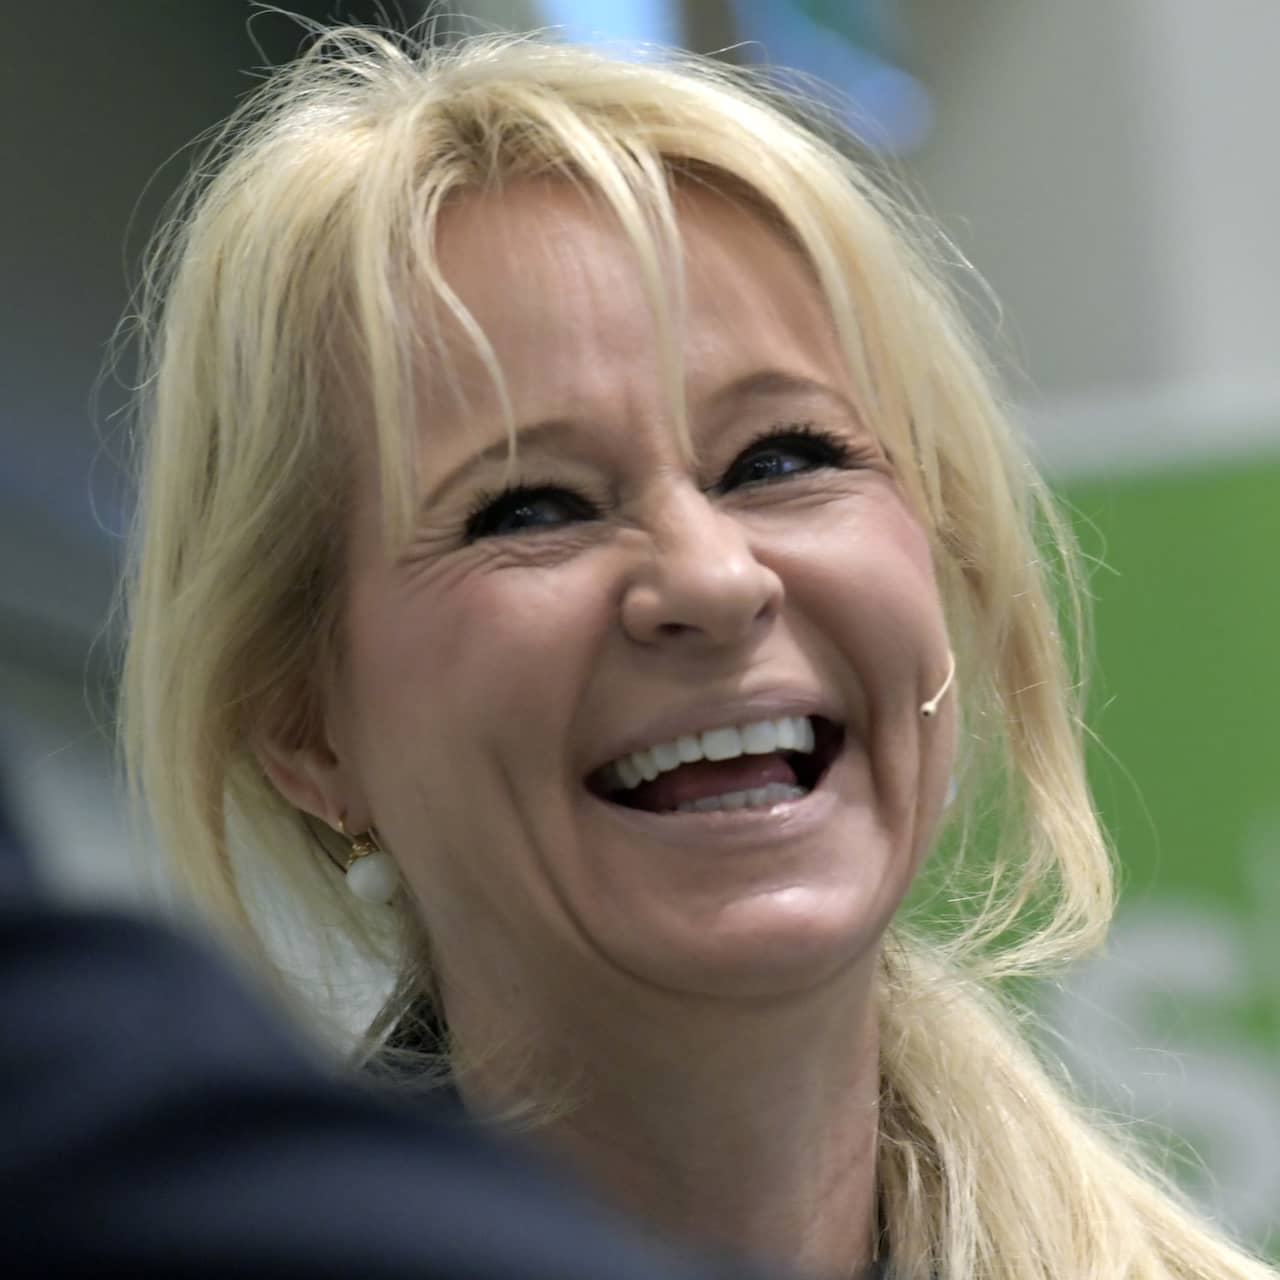 56. Annika Falkengren